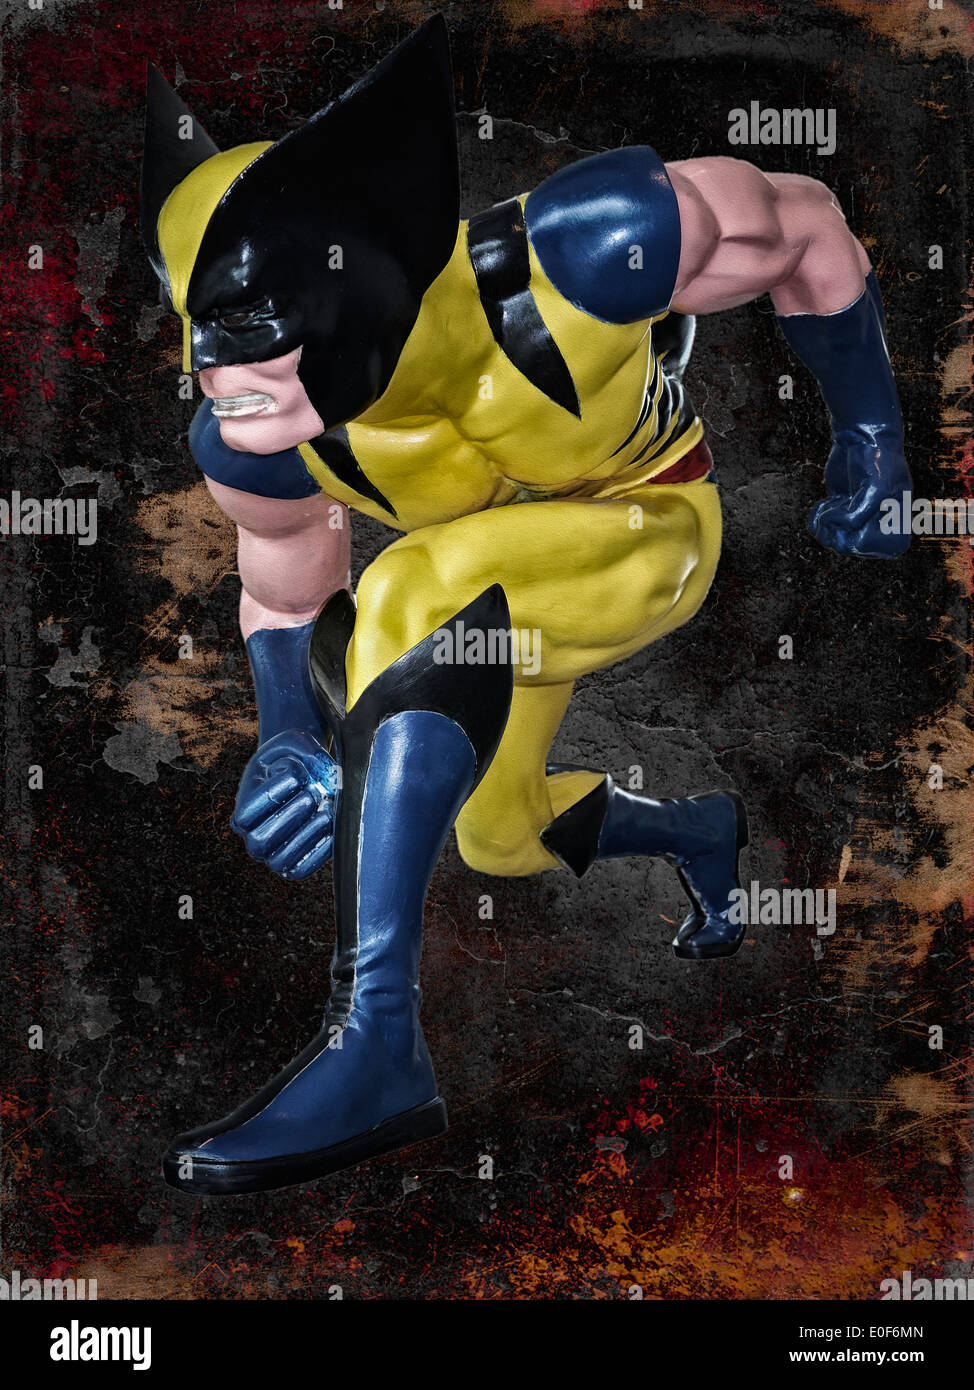 Painterly and grunge effect image of 'Wolverine', superhero figure. - Stock Image